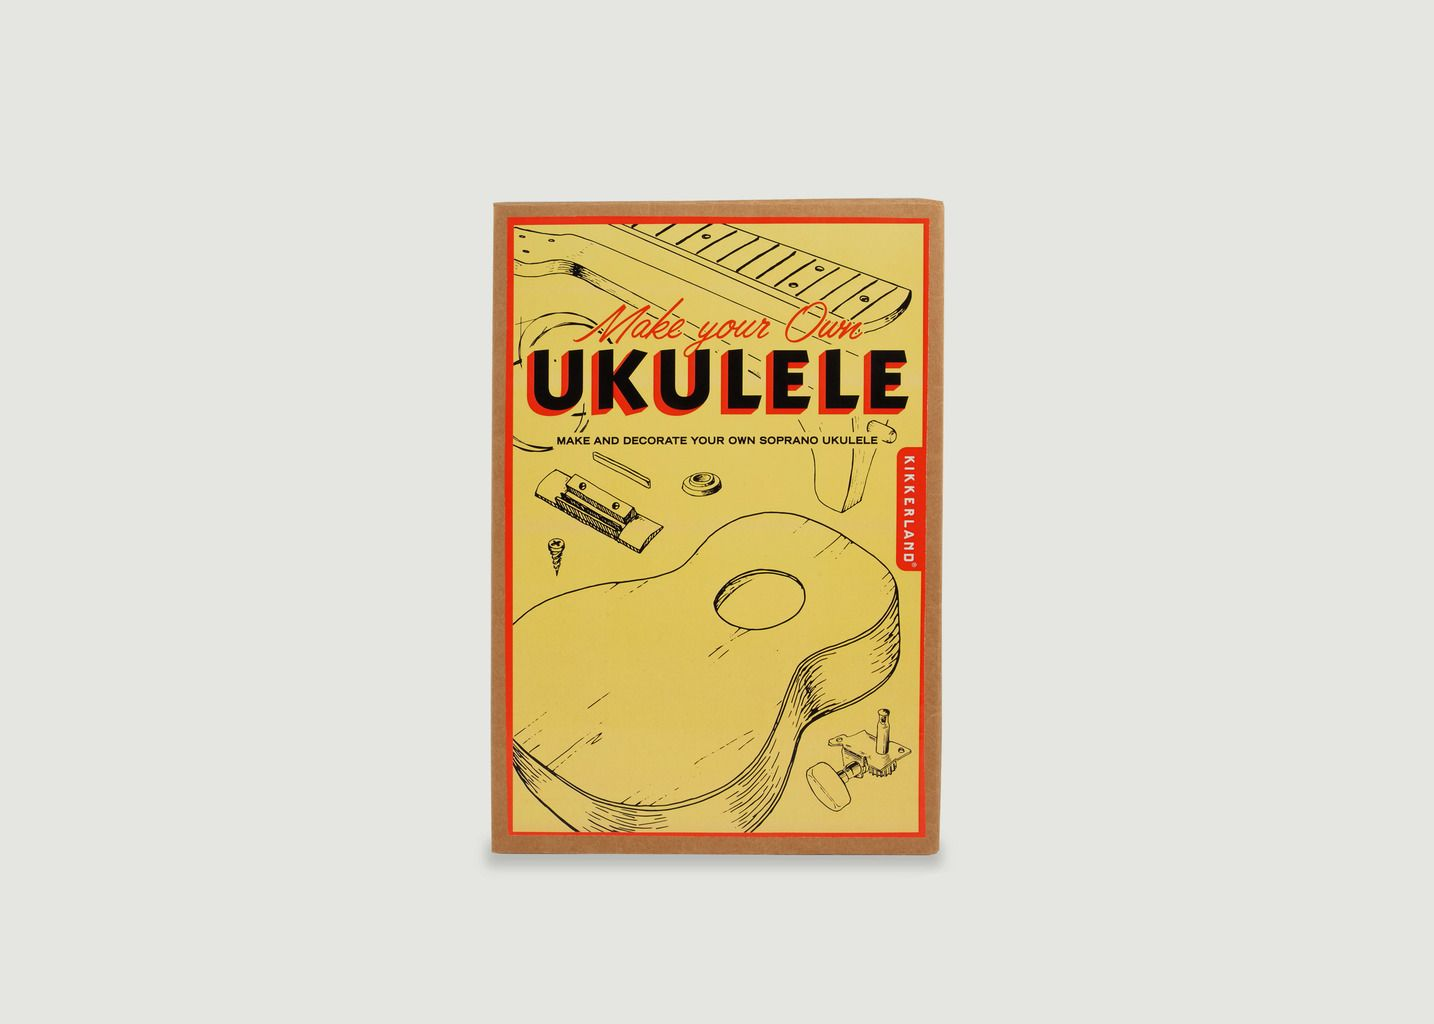 Kit Complet Ukulélé à Assembler Soi-Même - Kikkerland